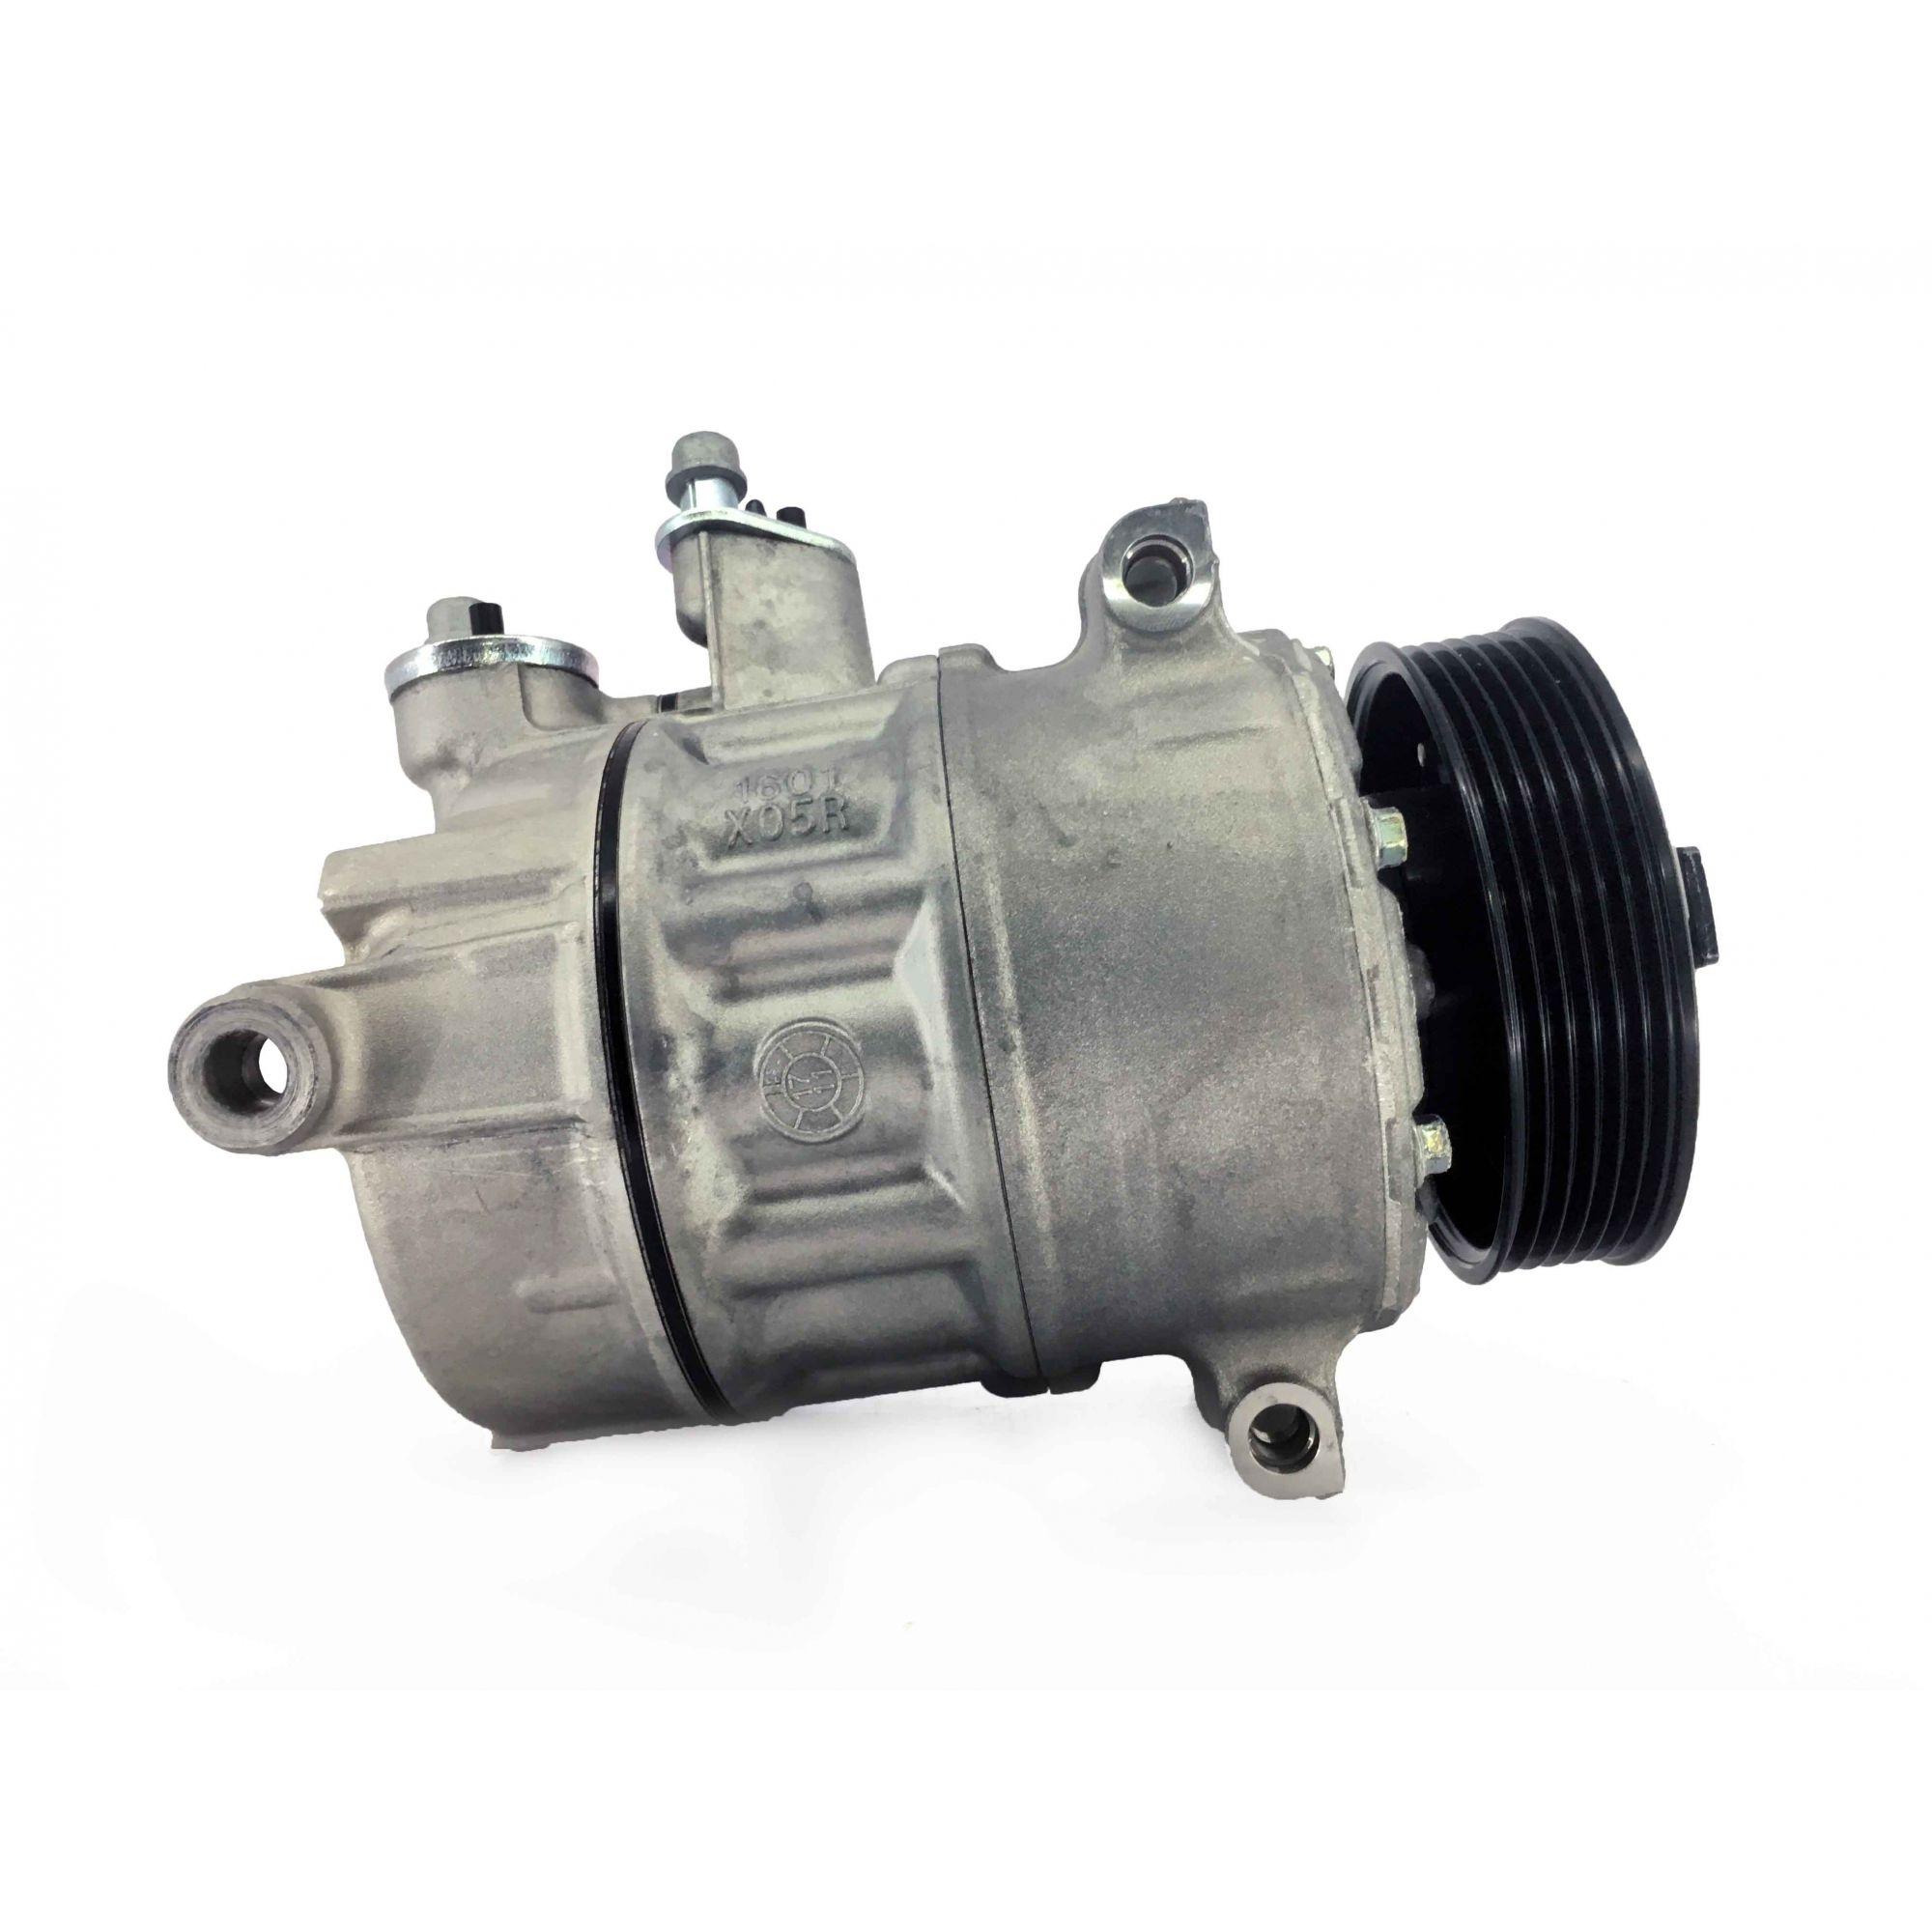 Compressor Golf / Jetta / Tiguan 2.0 - Original SANDEN